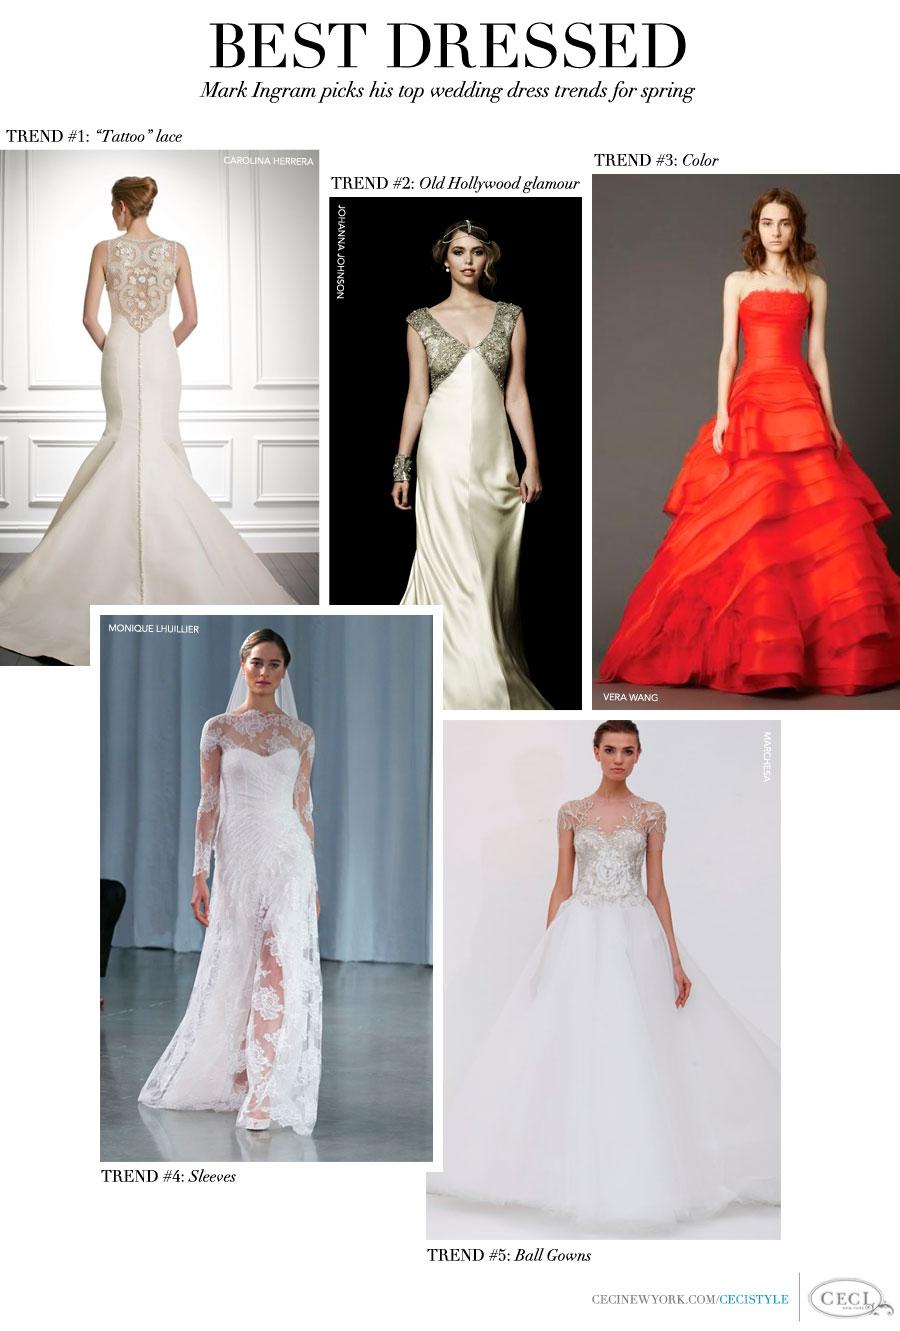 Best Dressed - Mark Ingram picks his top wedding dress trends for spring